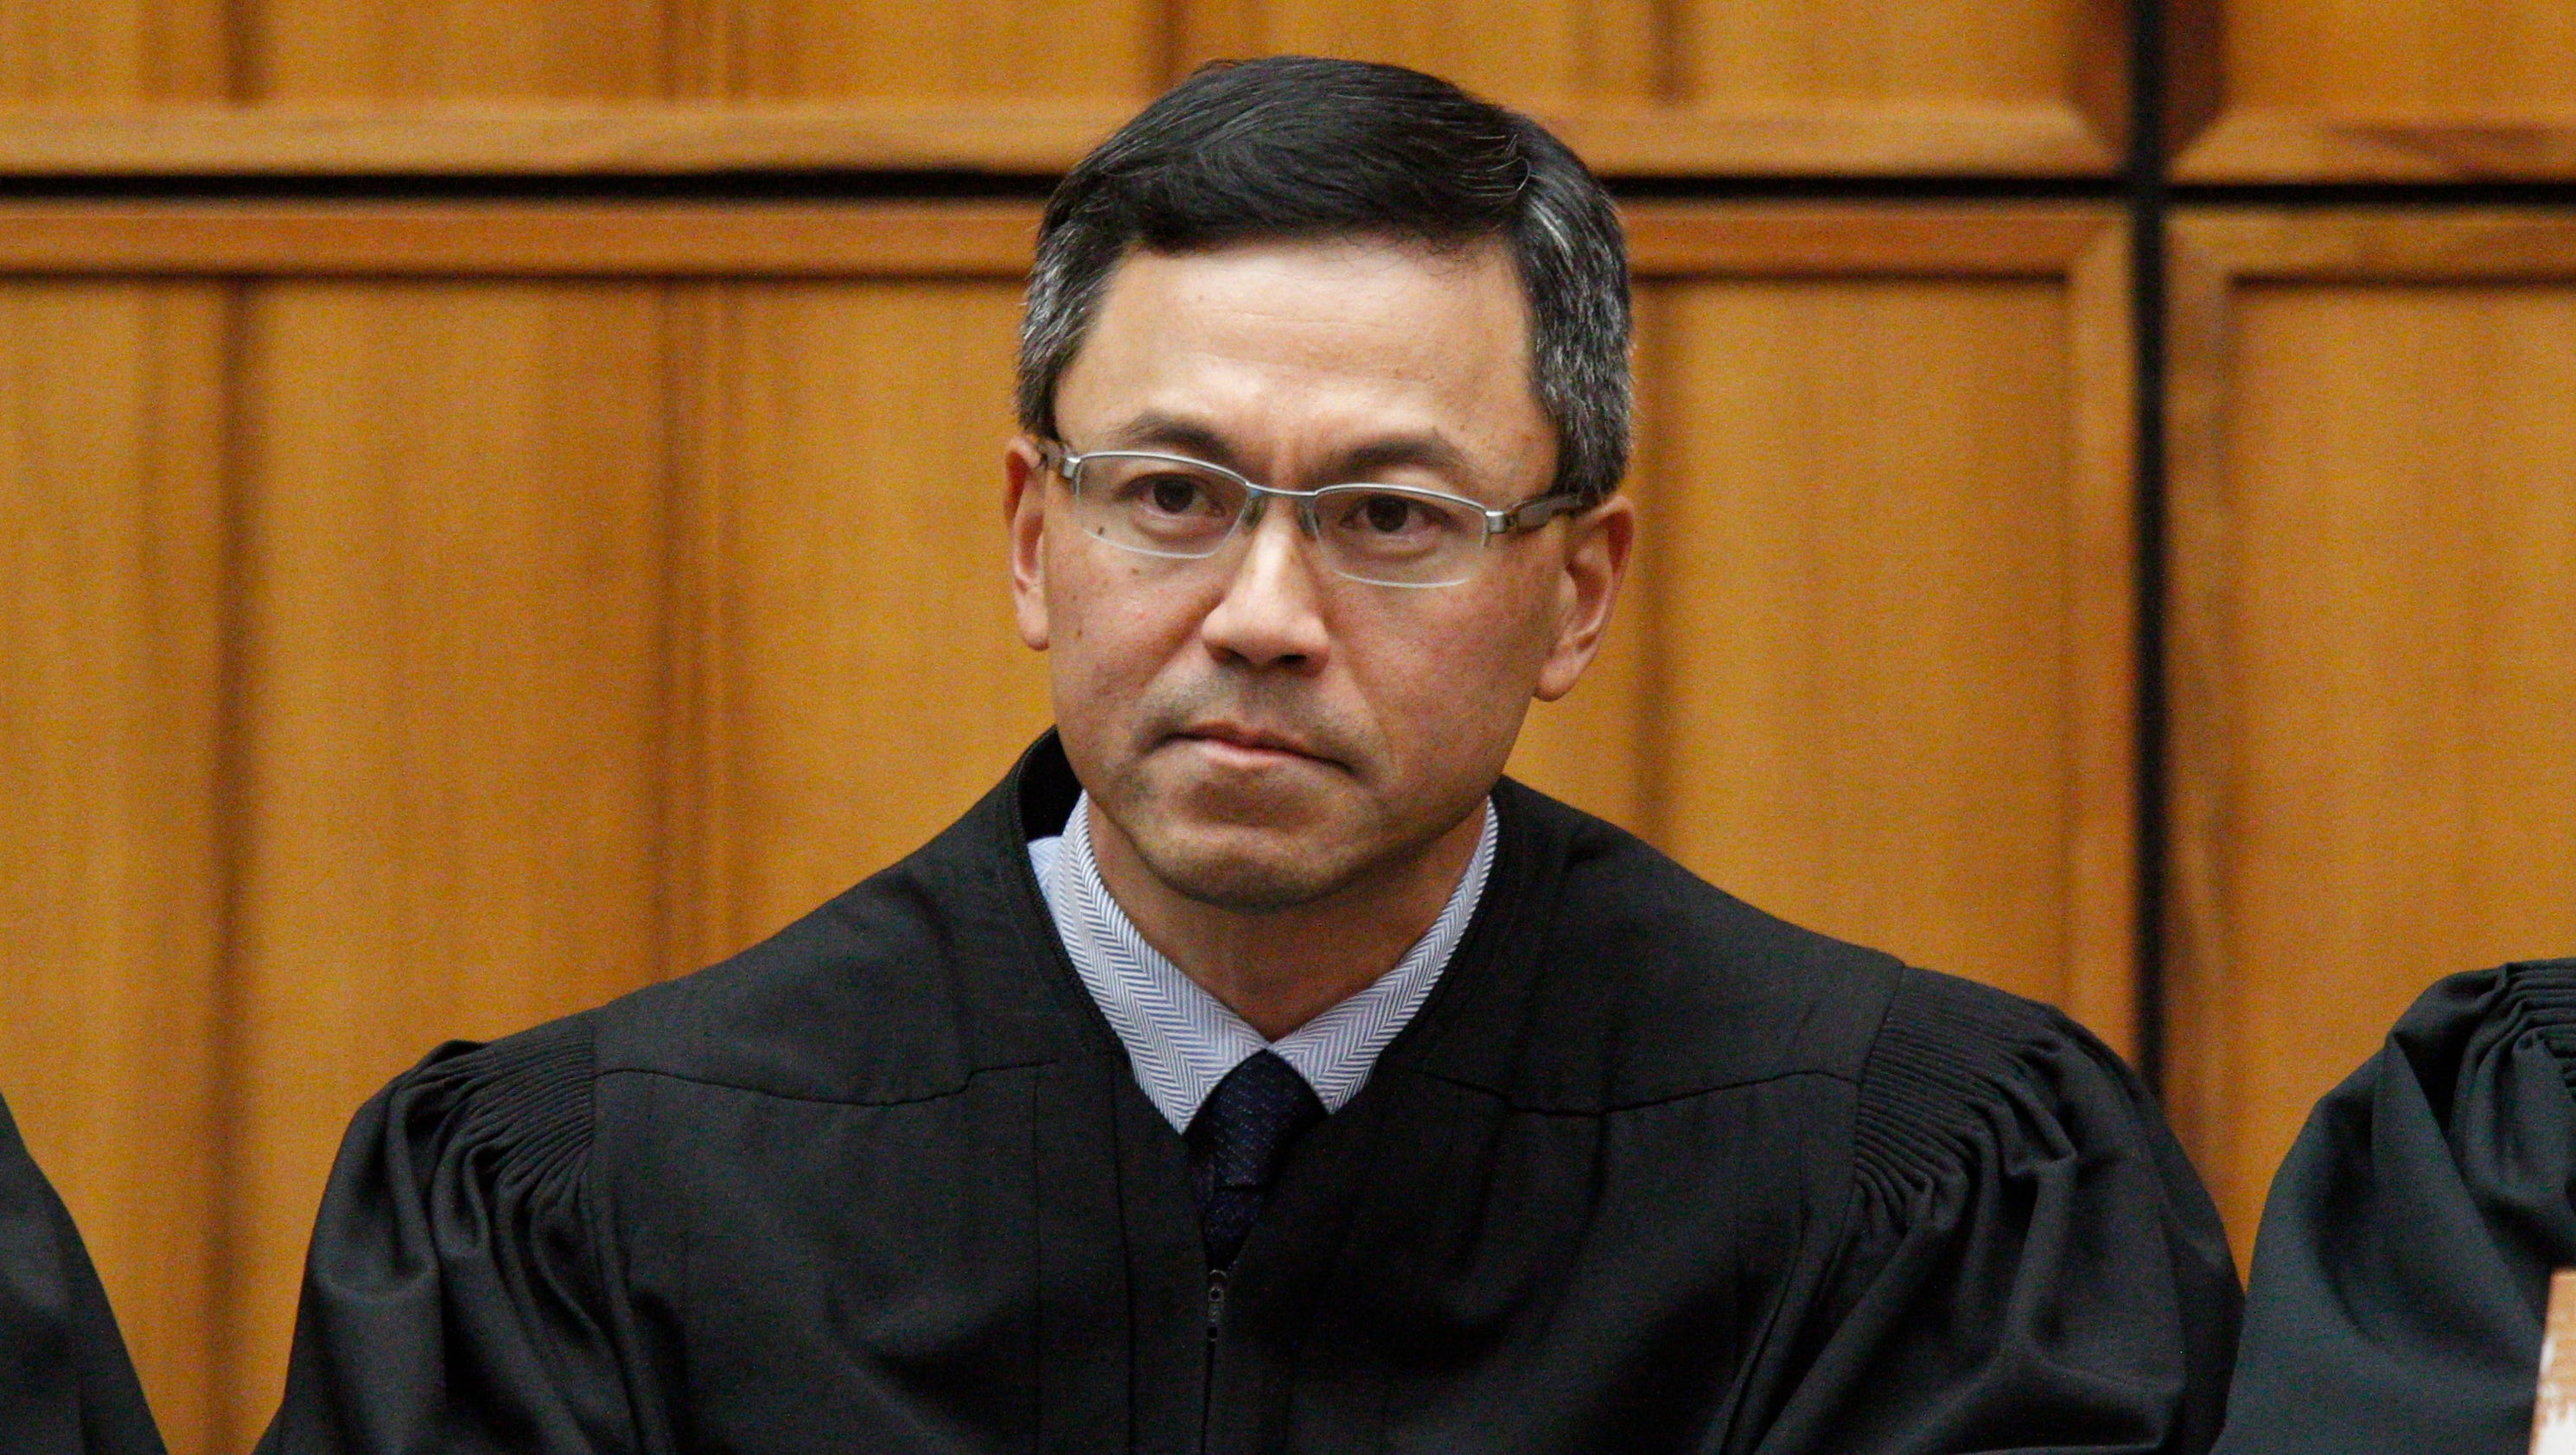 Federal judge in Hawaii blocks Trump's third travel ban